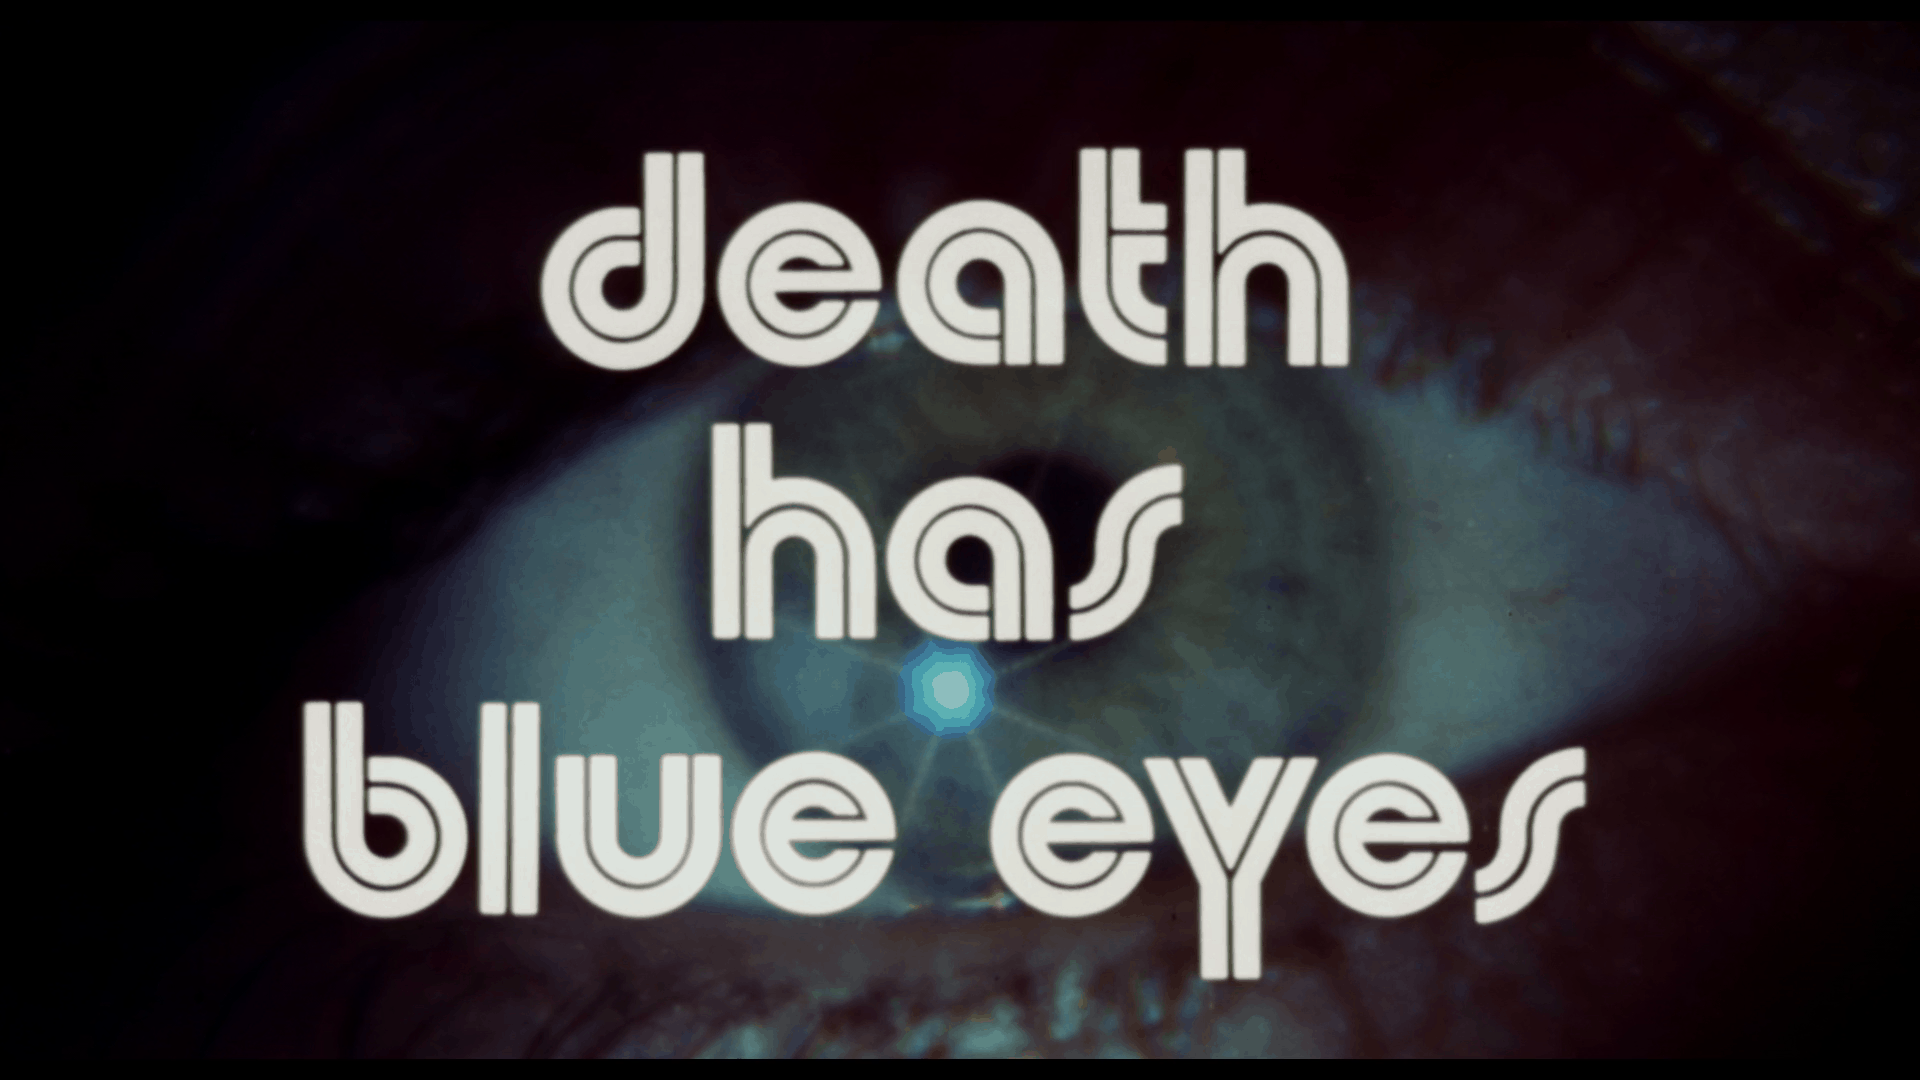 death has blue eyes title review pile